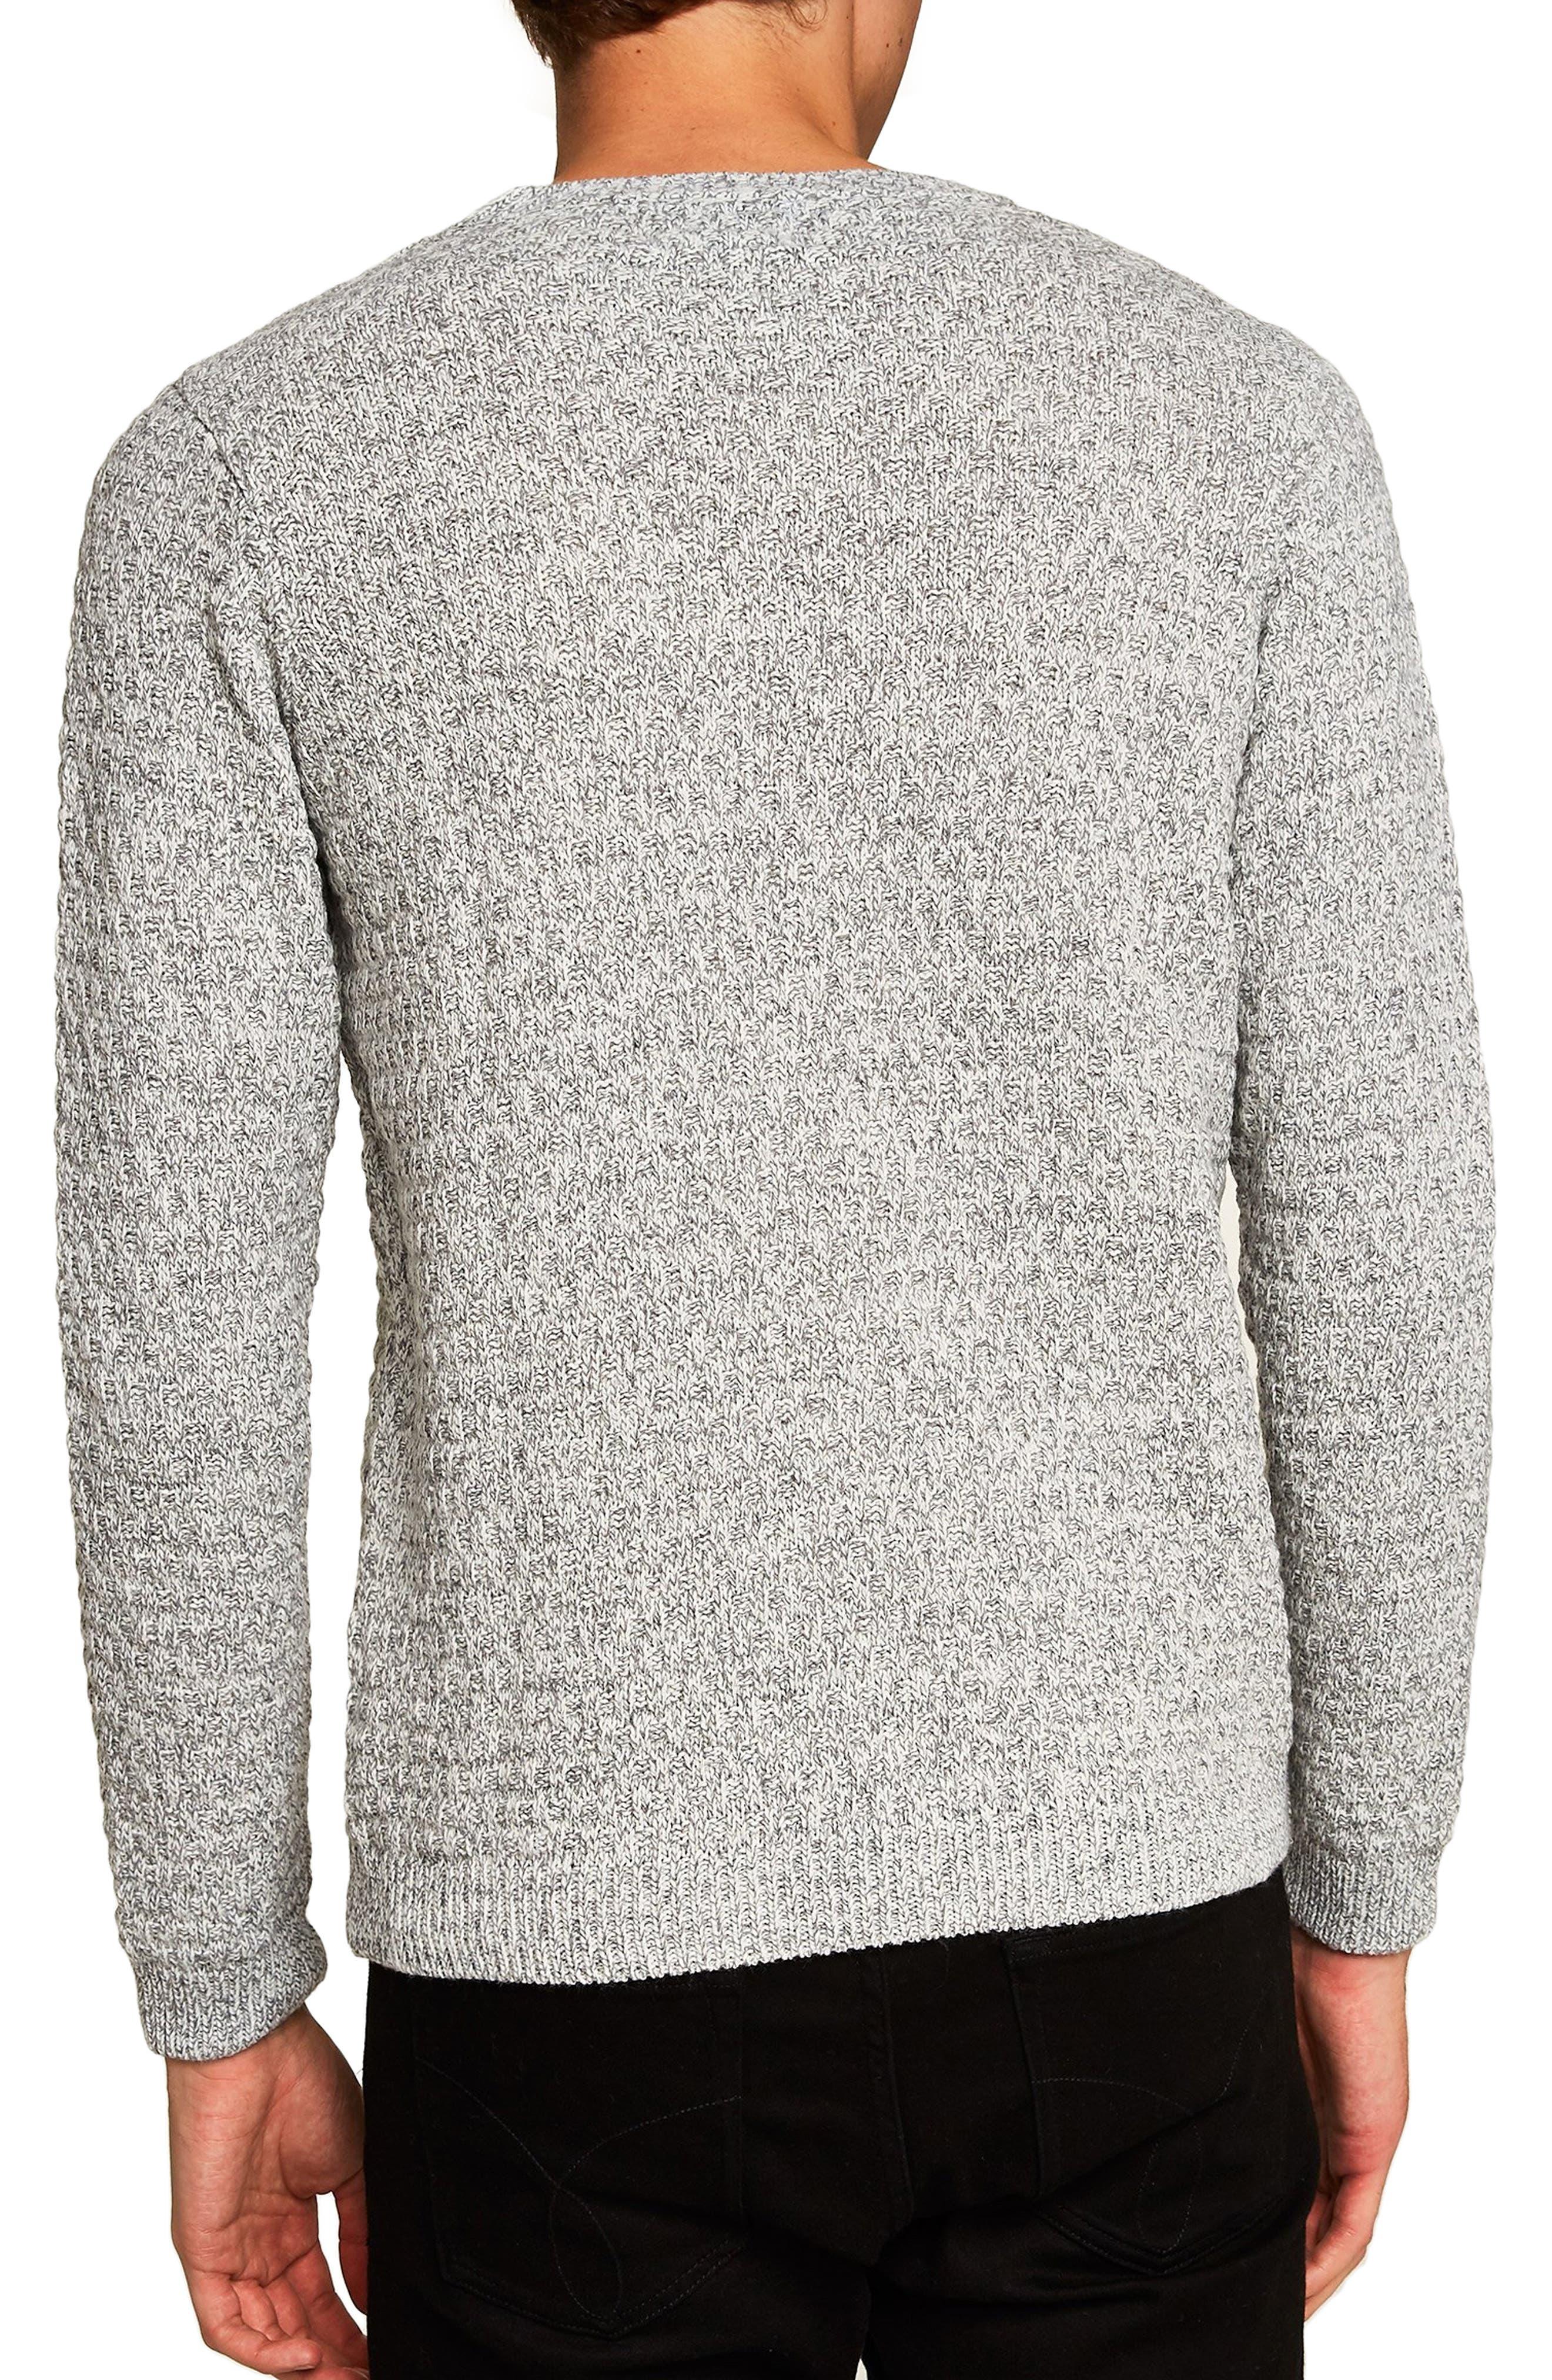 Textured Crewneck Sweater,                             Alternate thumbnail 2, color,                             020